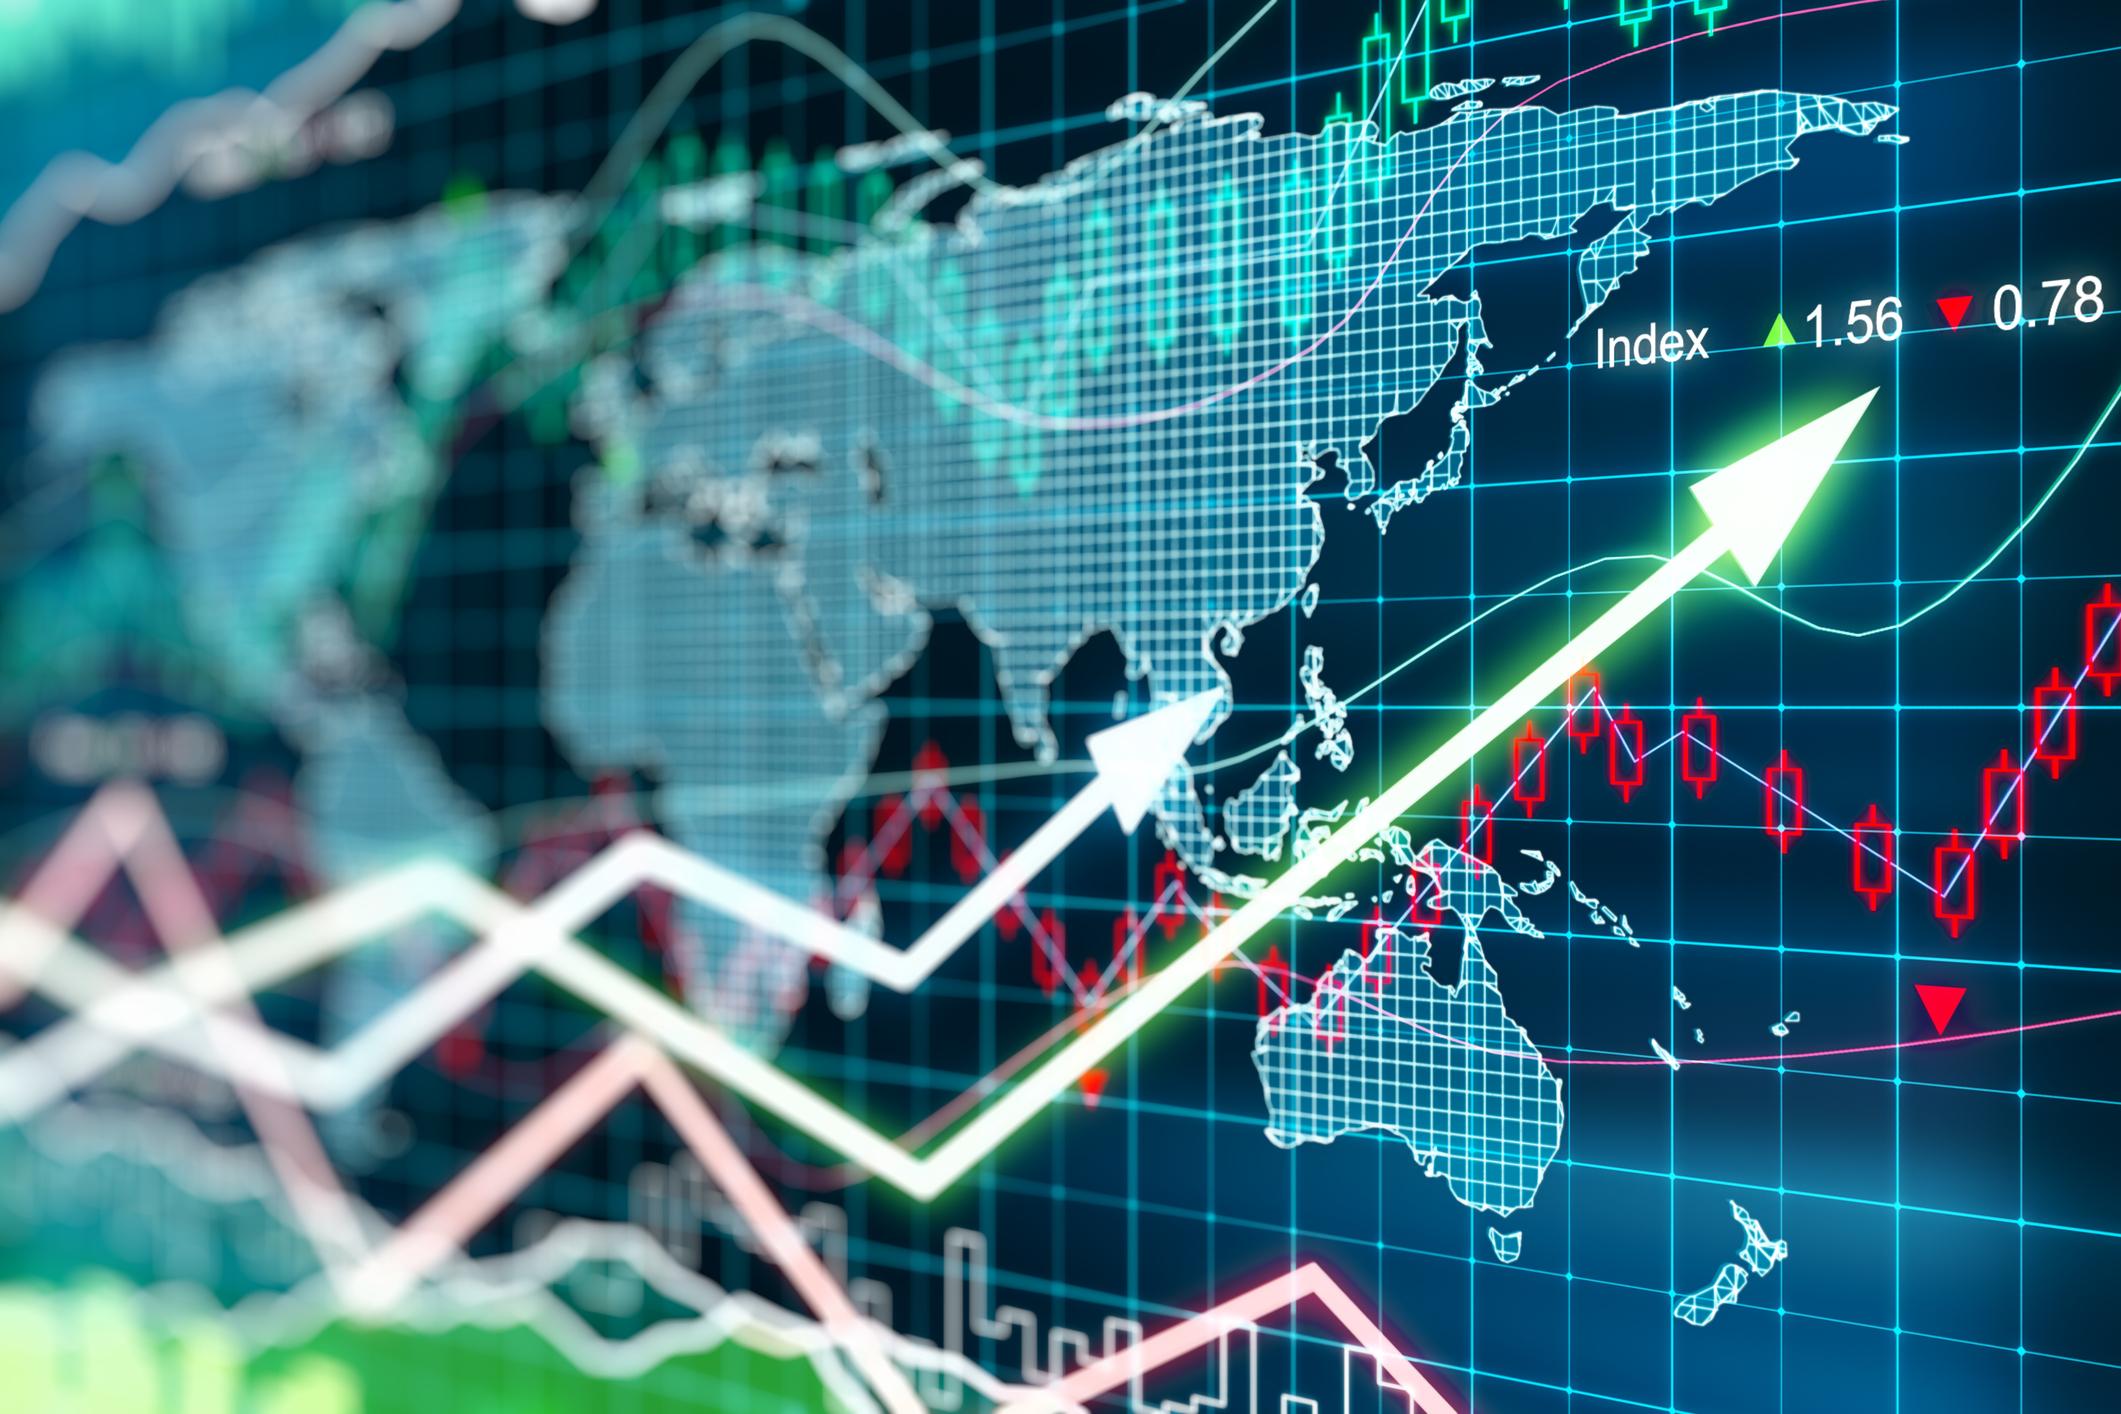 Stock market chart overlaying a digital world map